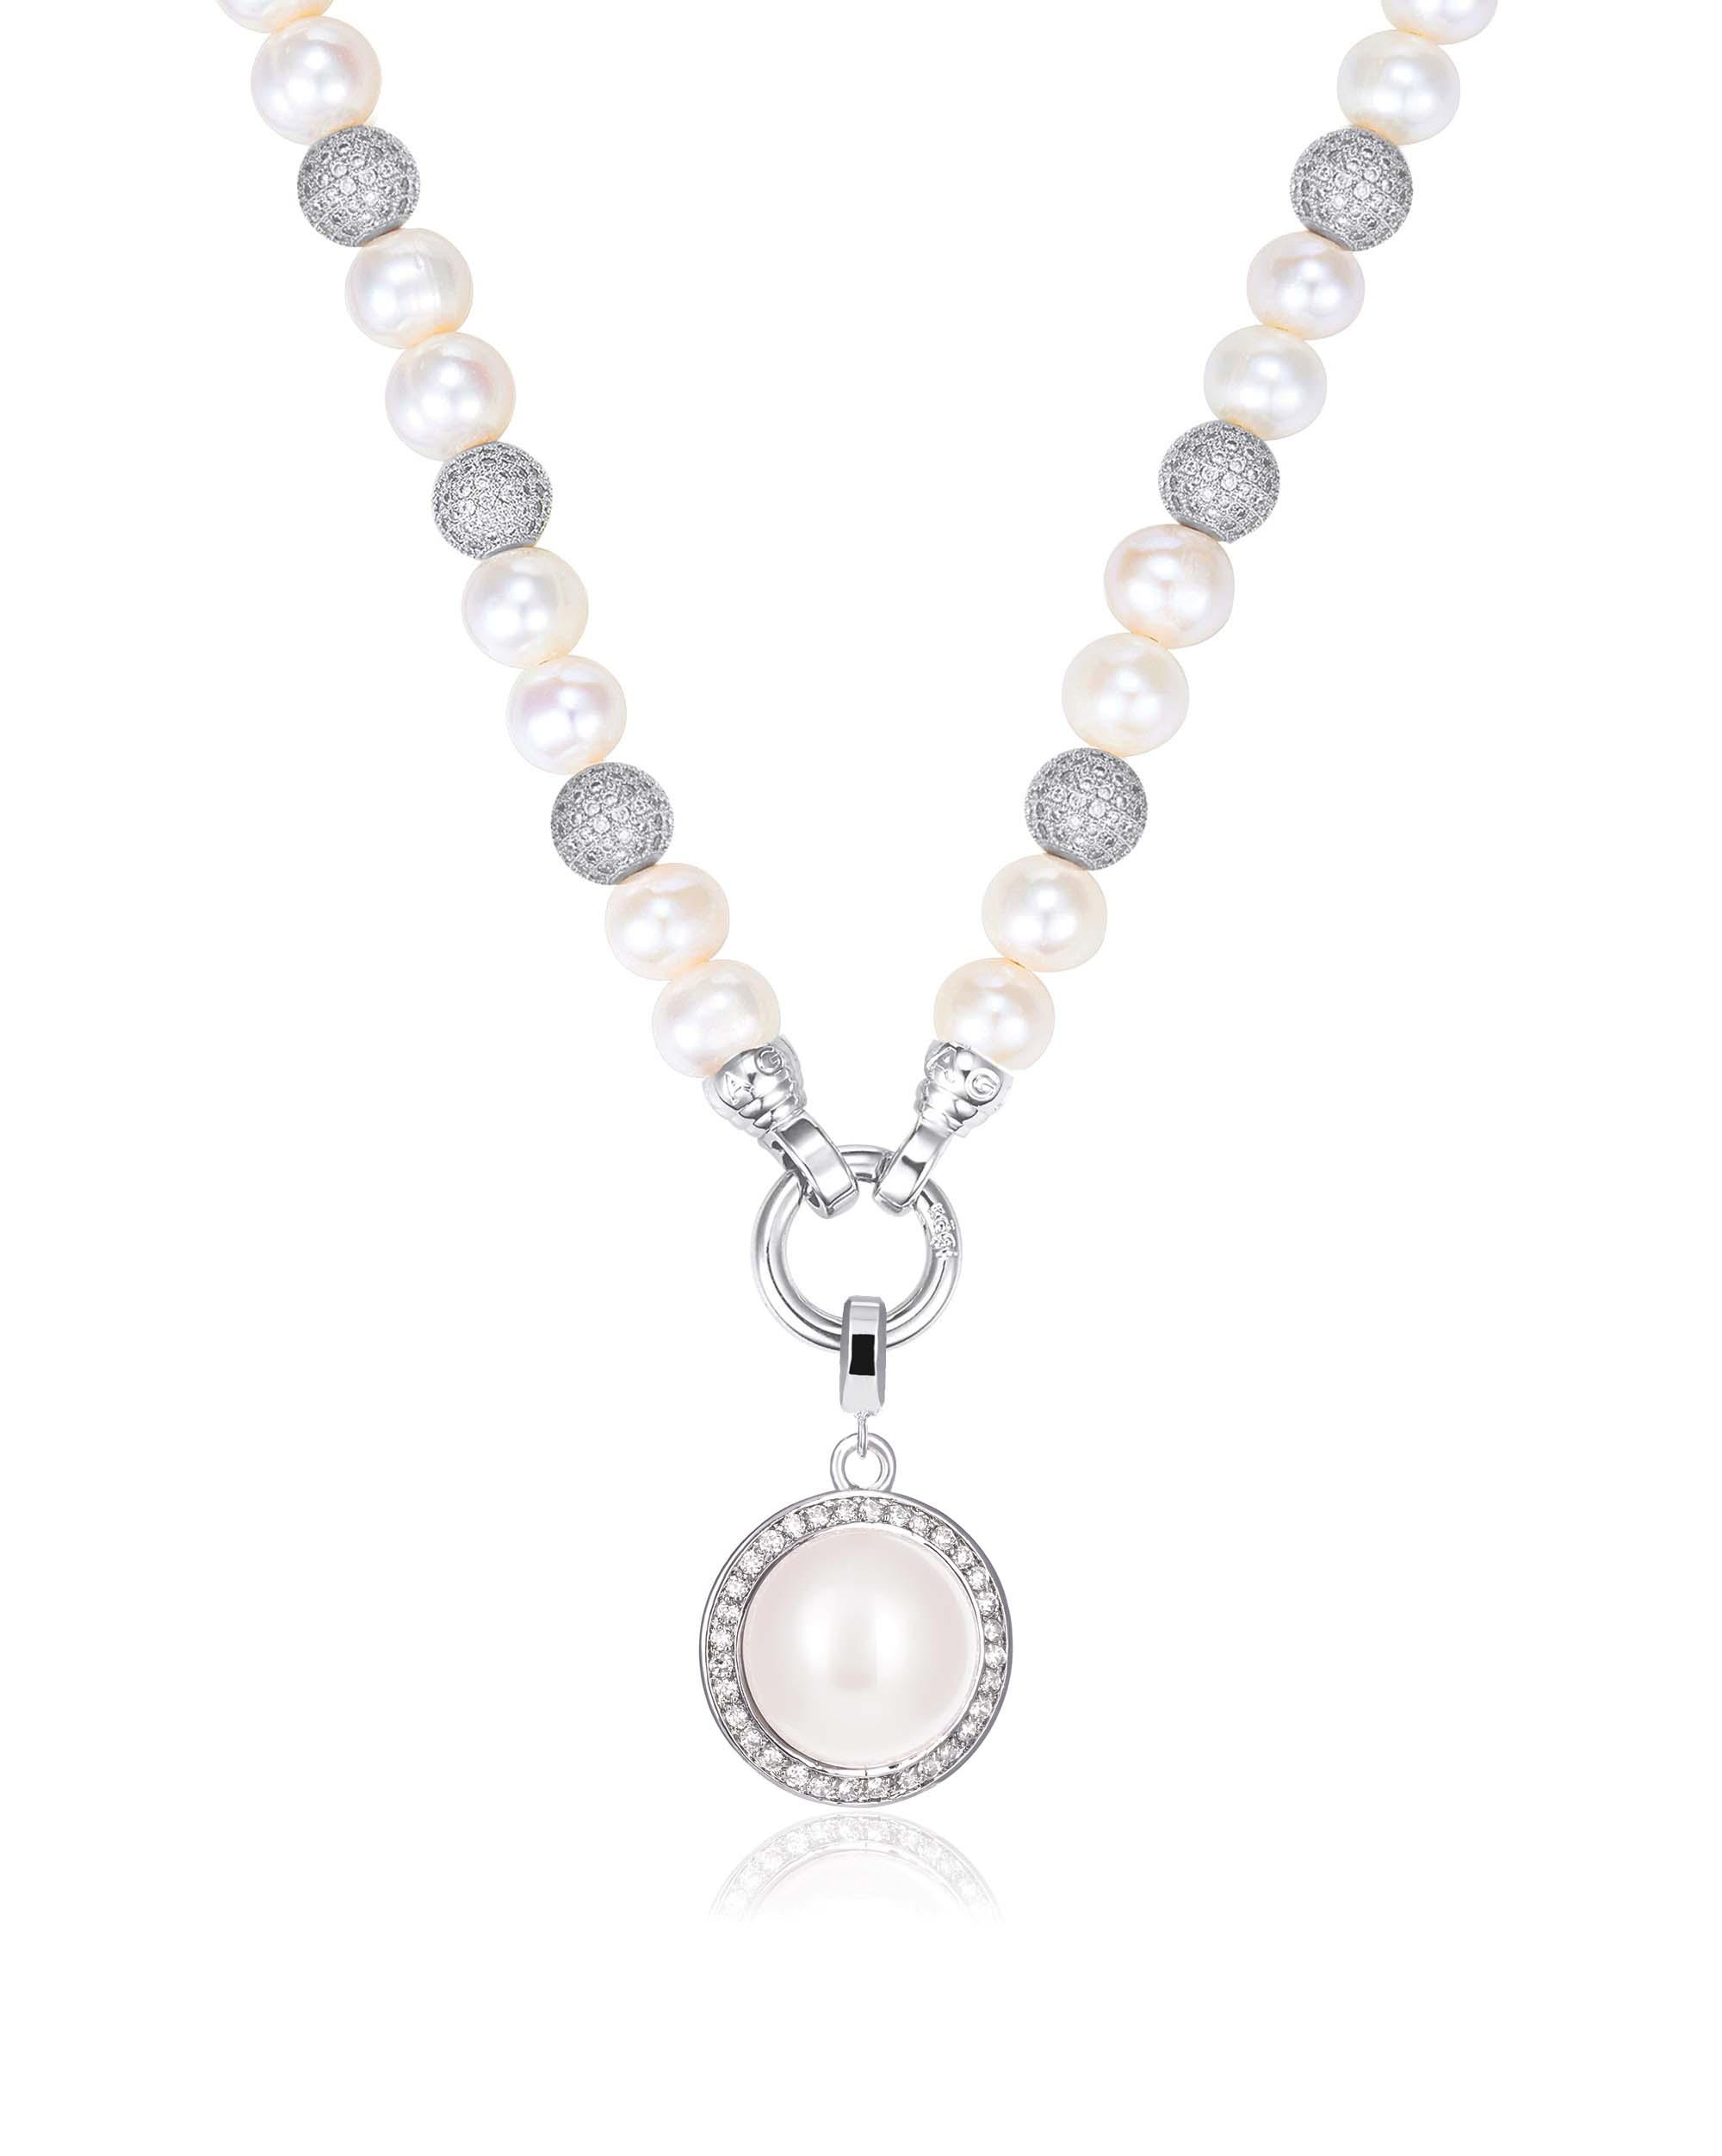 Kagi Pearl Luxe Necklace with Pearl Orbit Medium Pendant $139 www.kagi.net